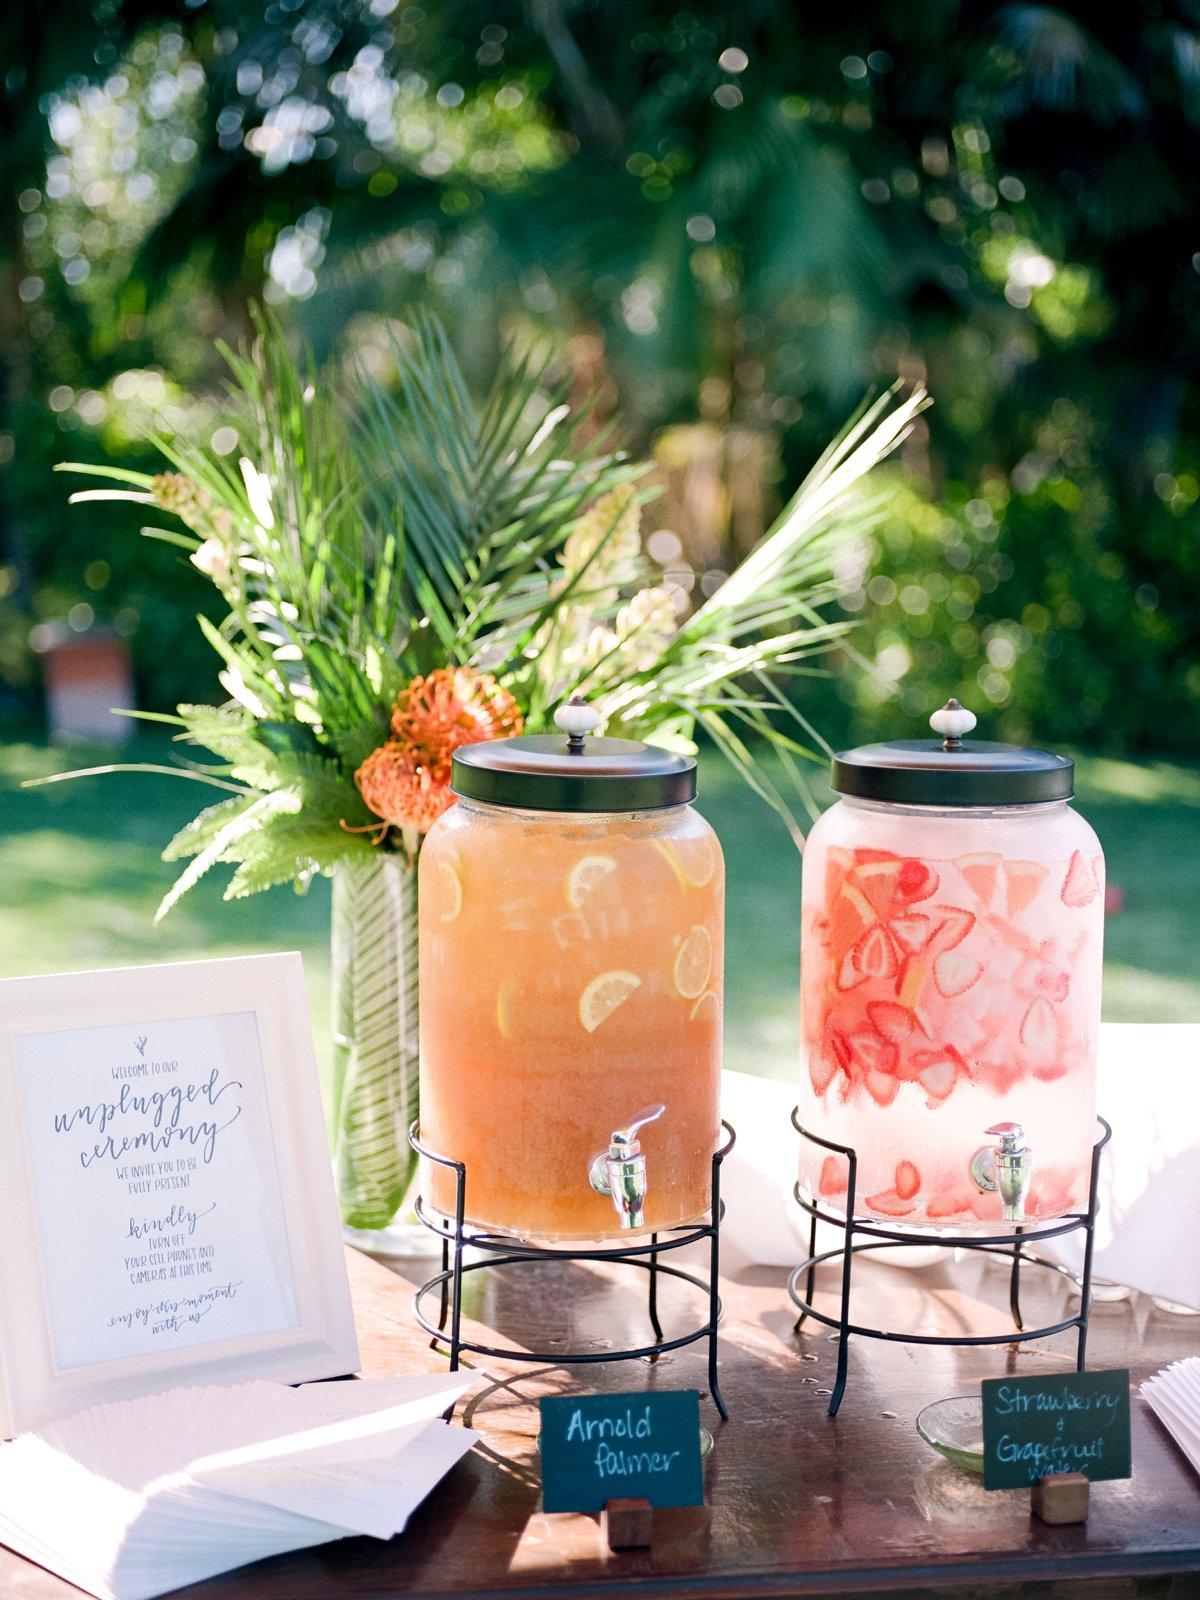 wedding cocktail drinks - photo by Anna Delores http://ruffledblog.com/chic-modern-wedding-at-four-seasons-santa-barbara